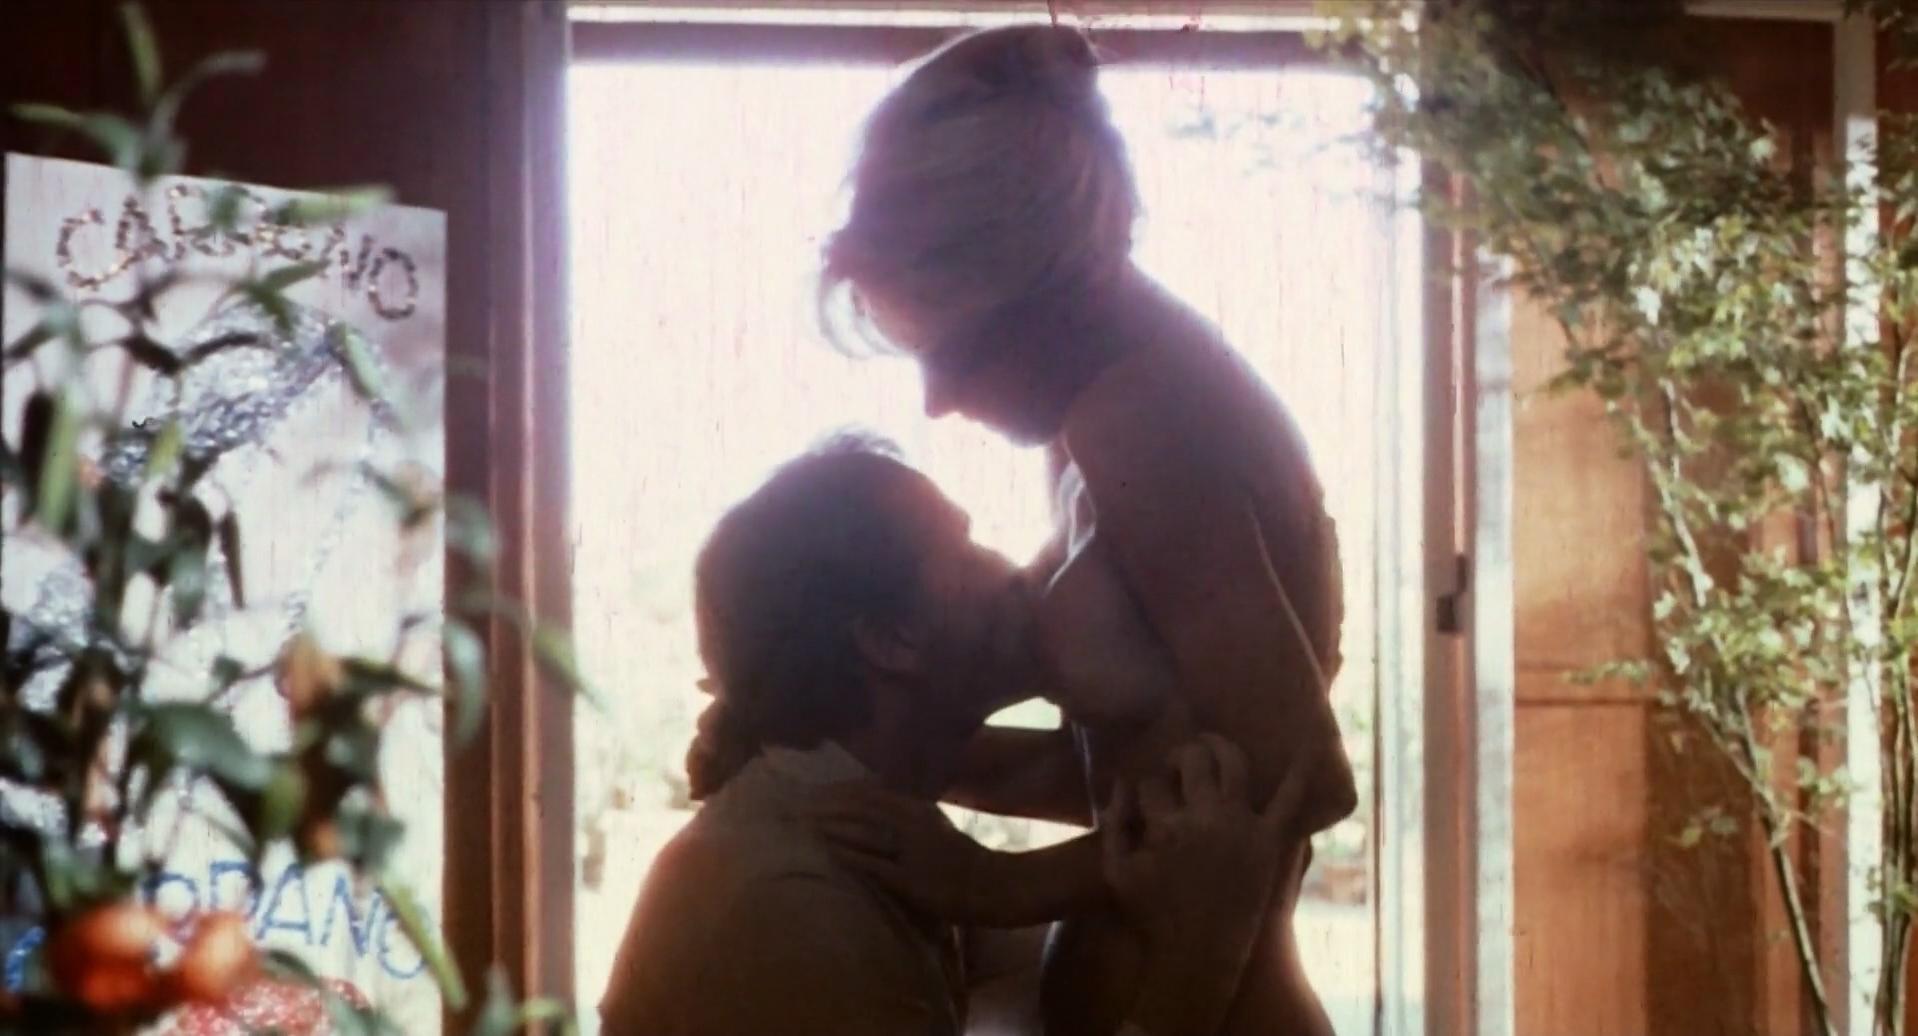 Carla Gravina nude, Anita Strindberg nude - The Antichrist (1974)